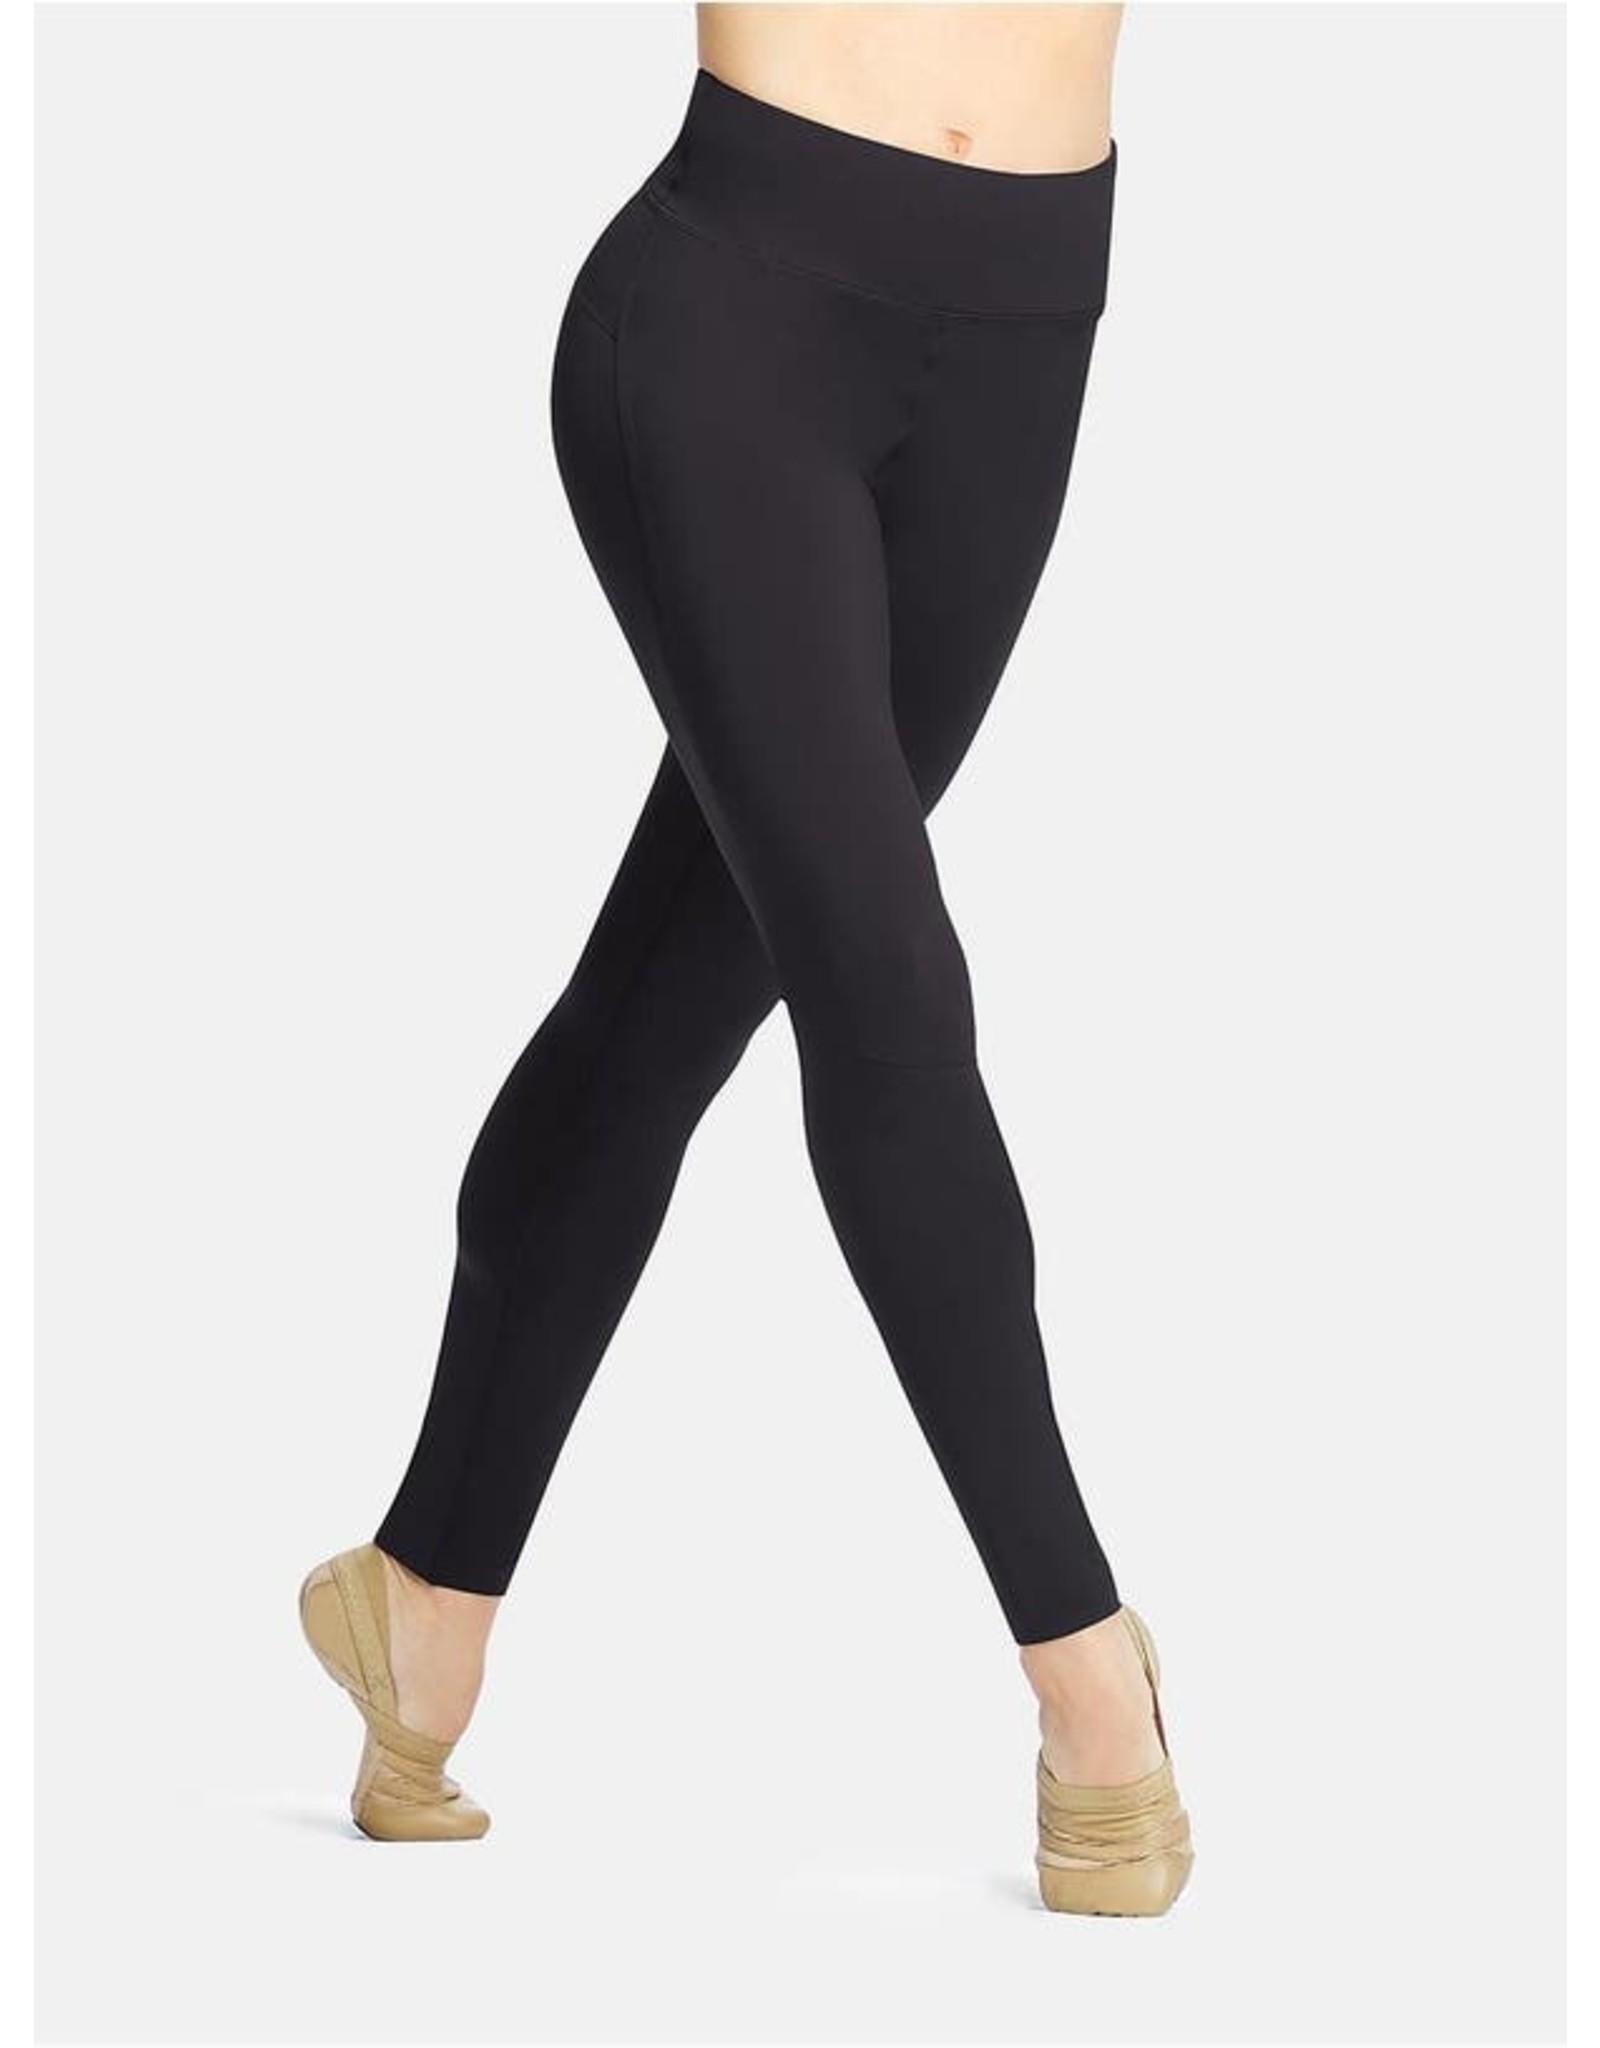 Capezio 11288W Tech Full Length Legging